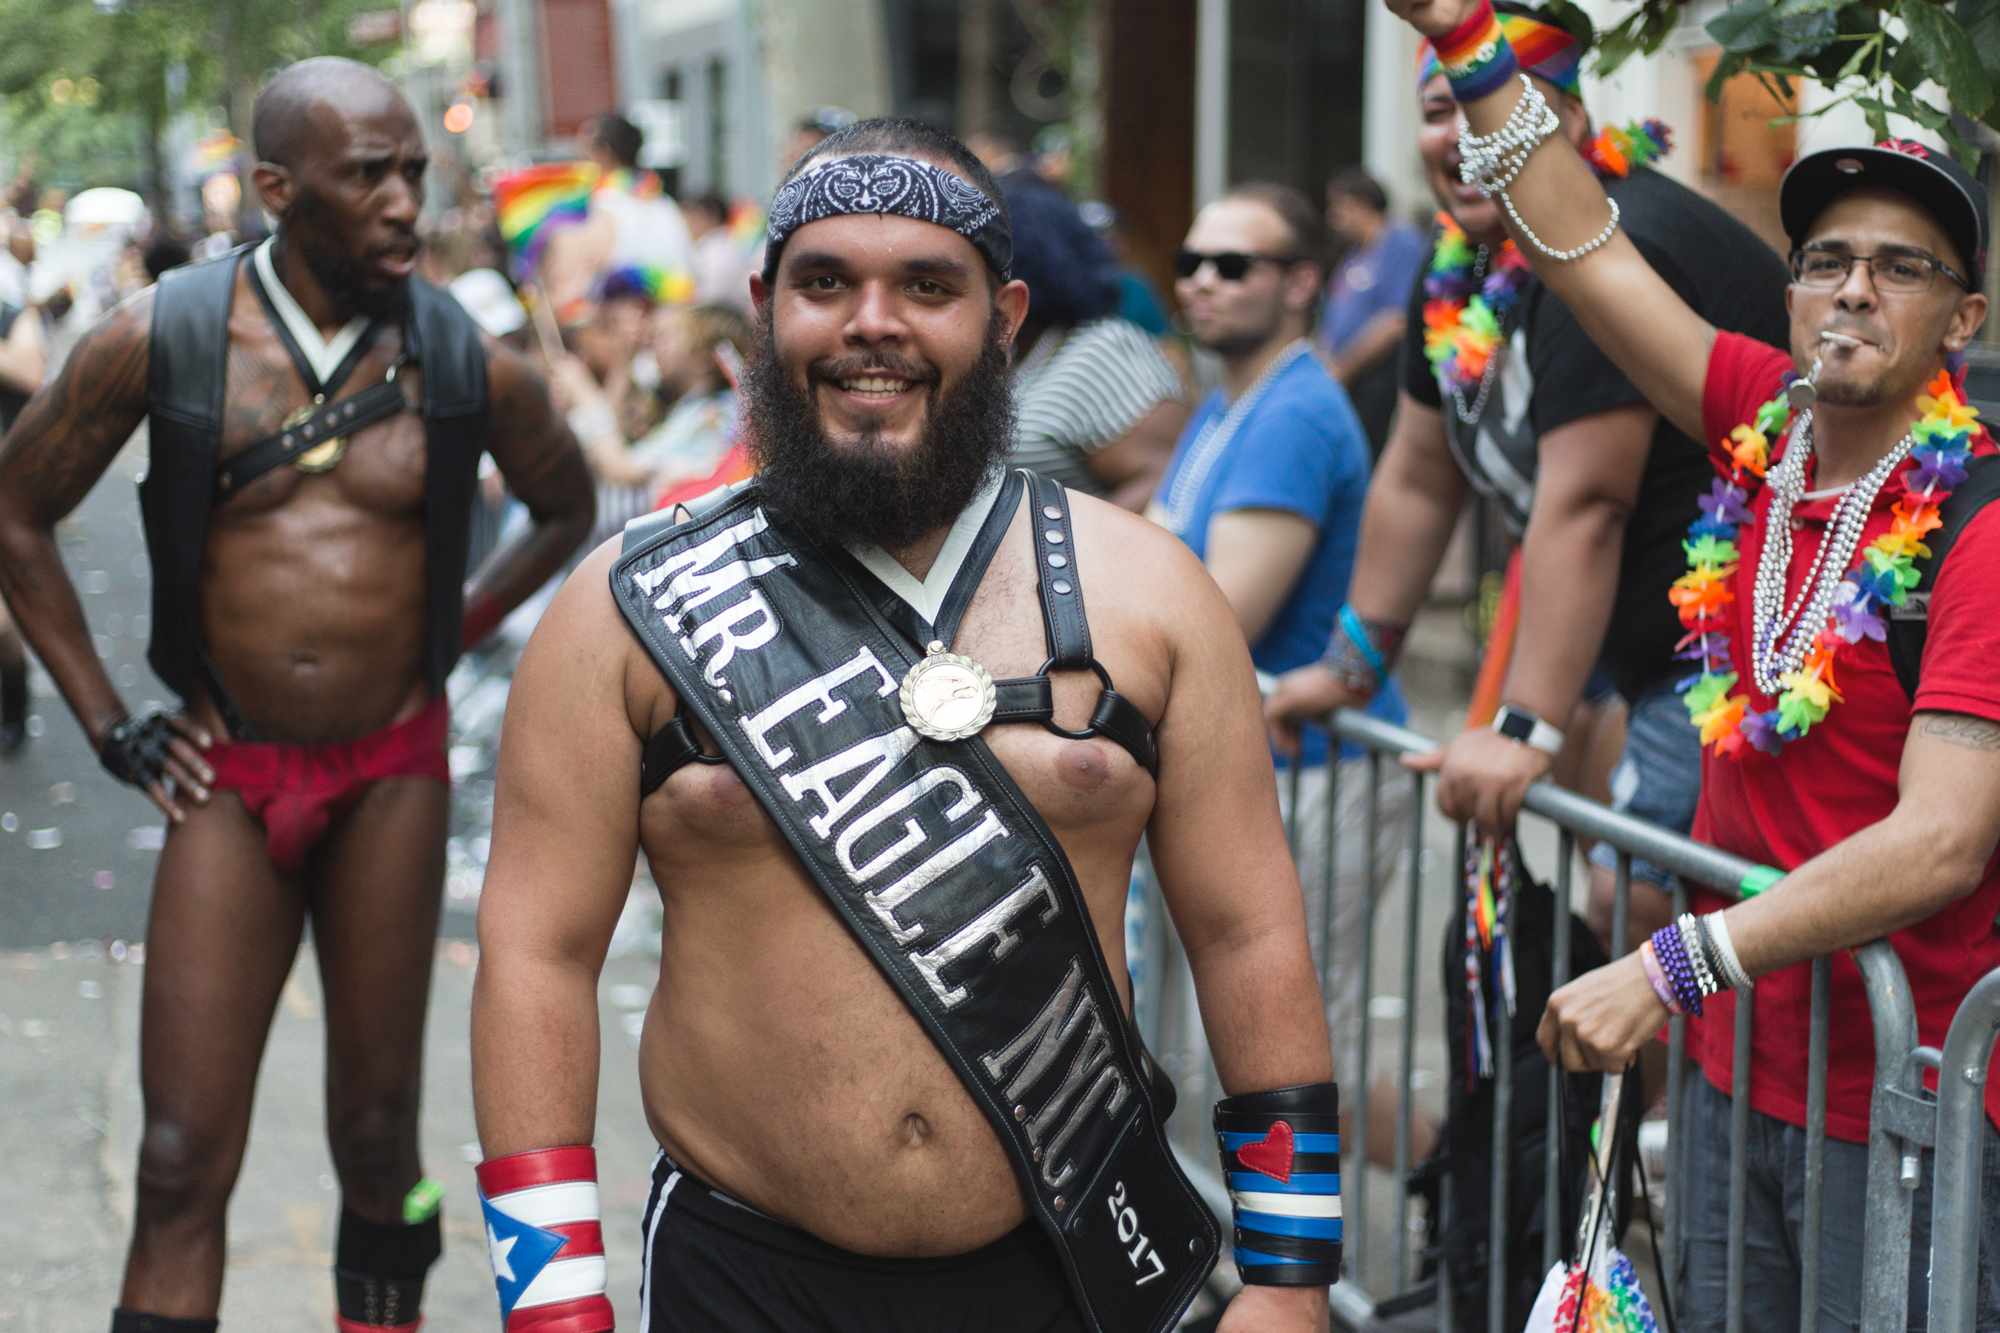 PrideWithEagle_39.jpg